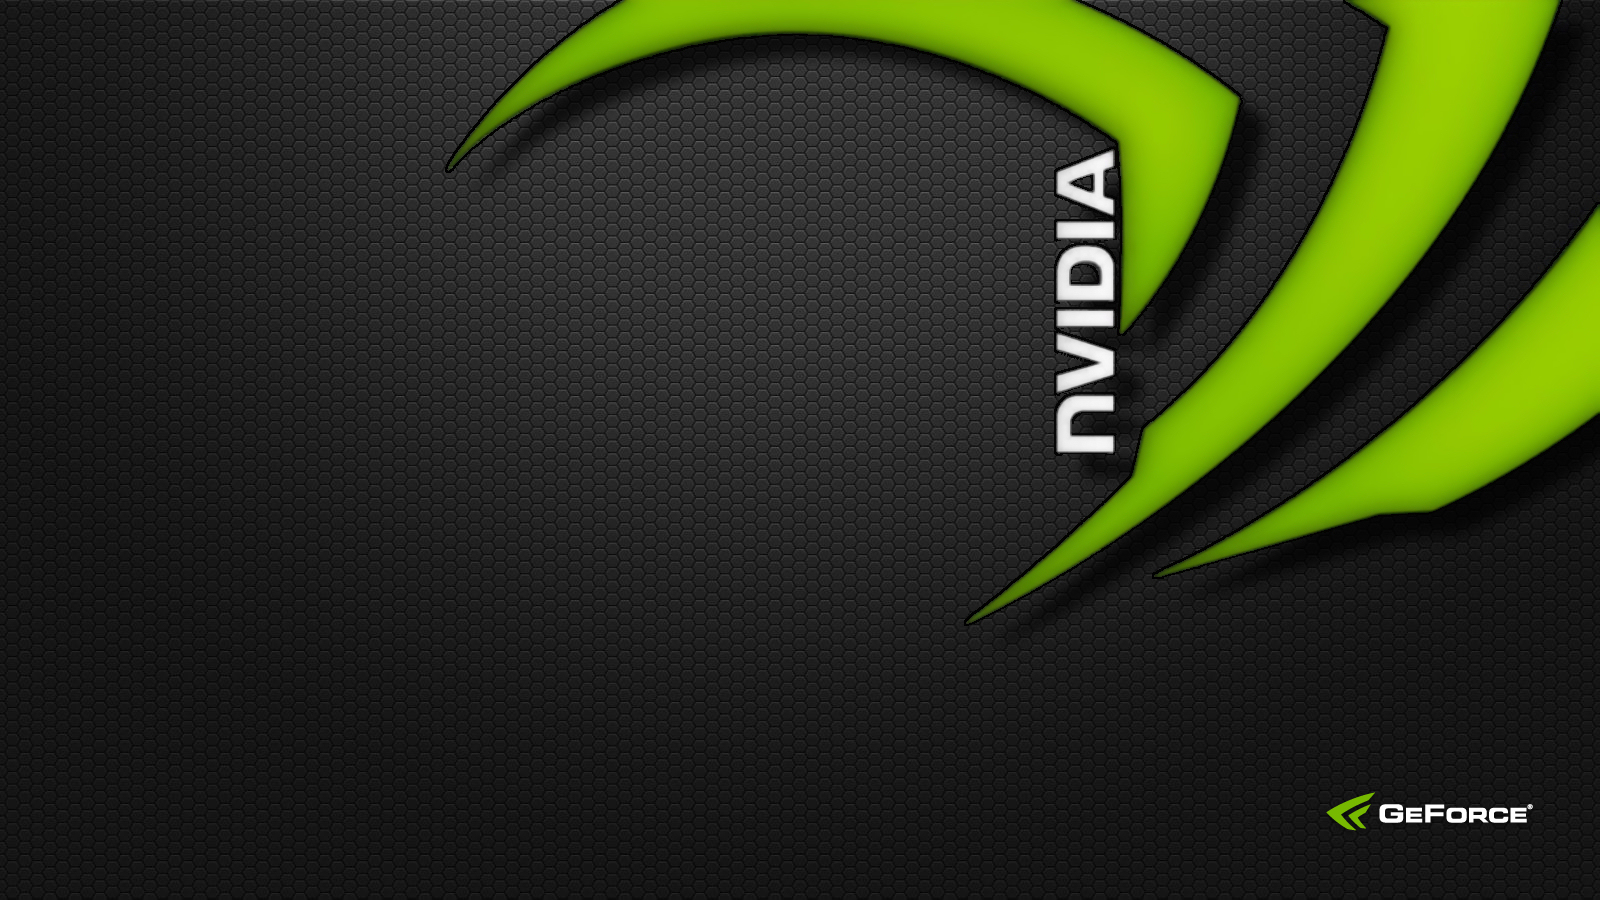 Nvidia wallpaper 1920x1080 hd wallpapersafari - 1920x1080 wallpaper nvidia ...